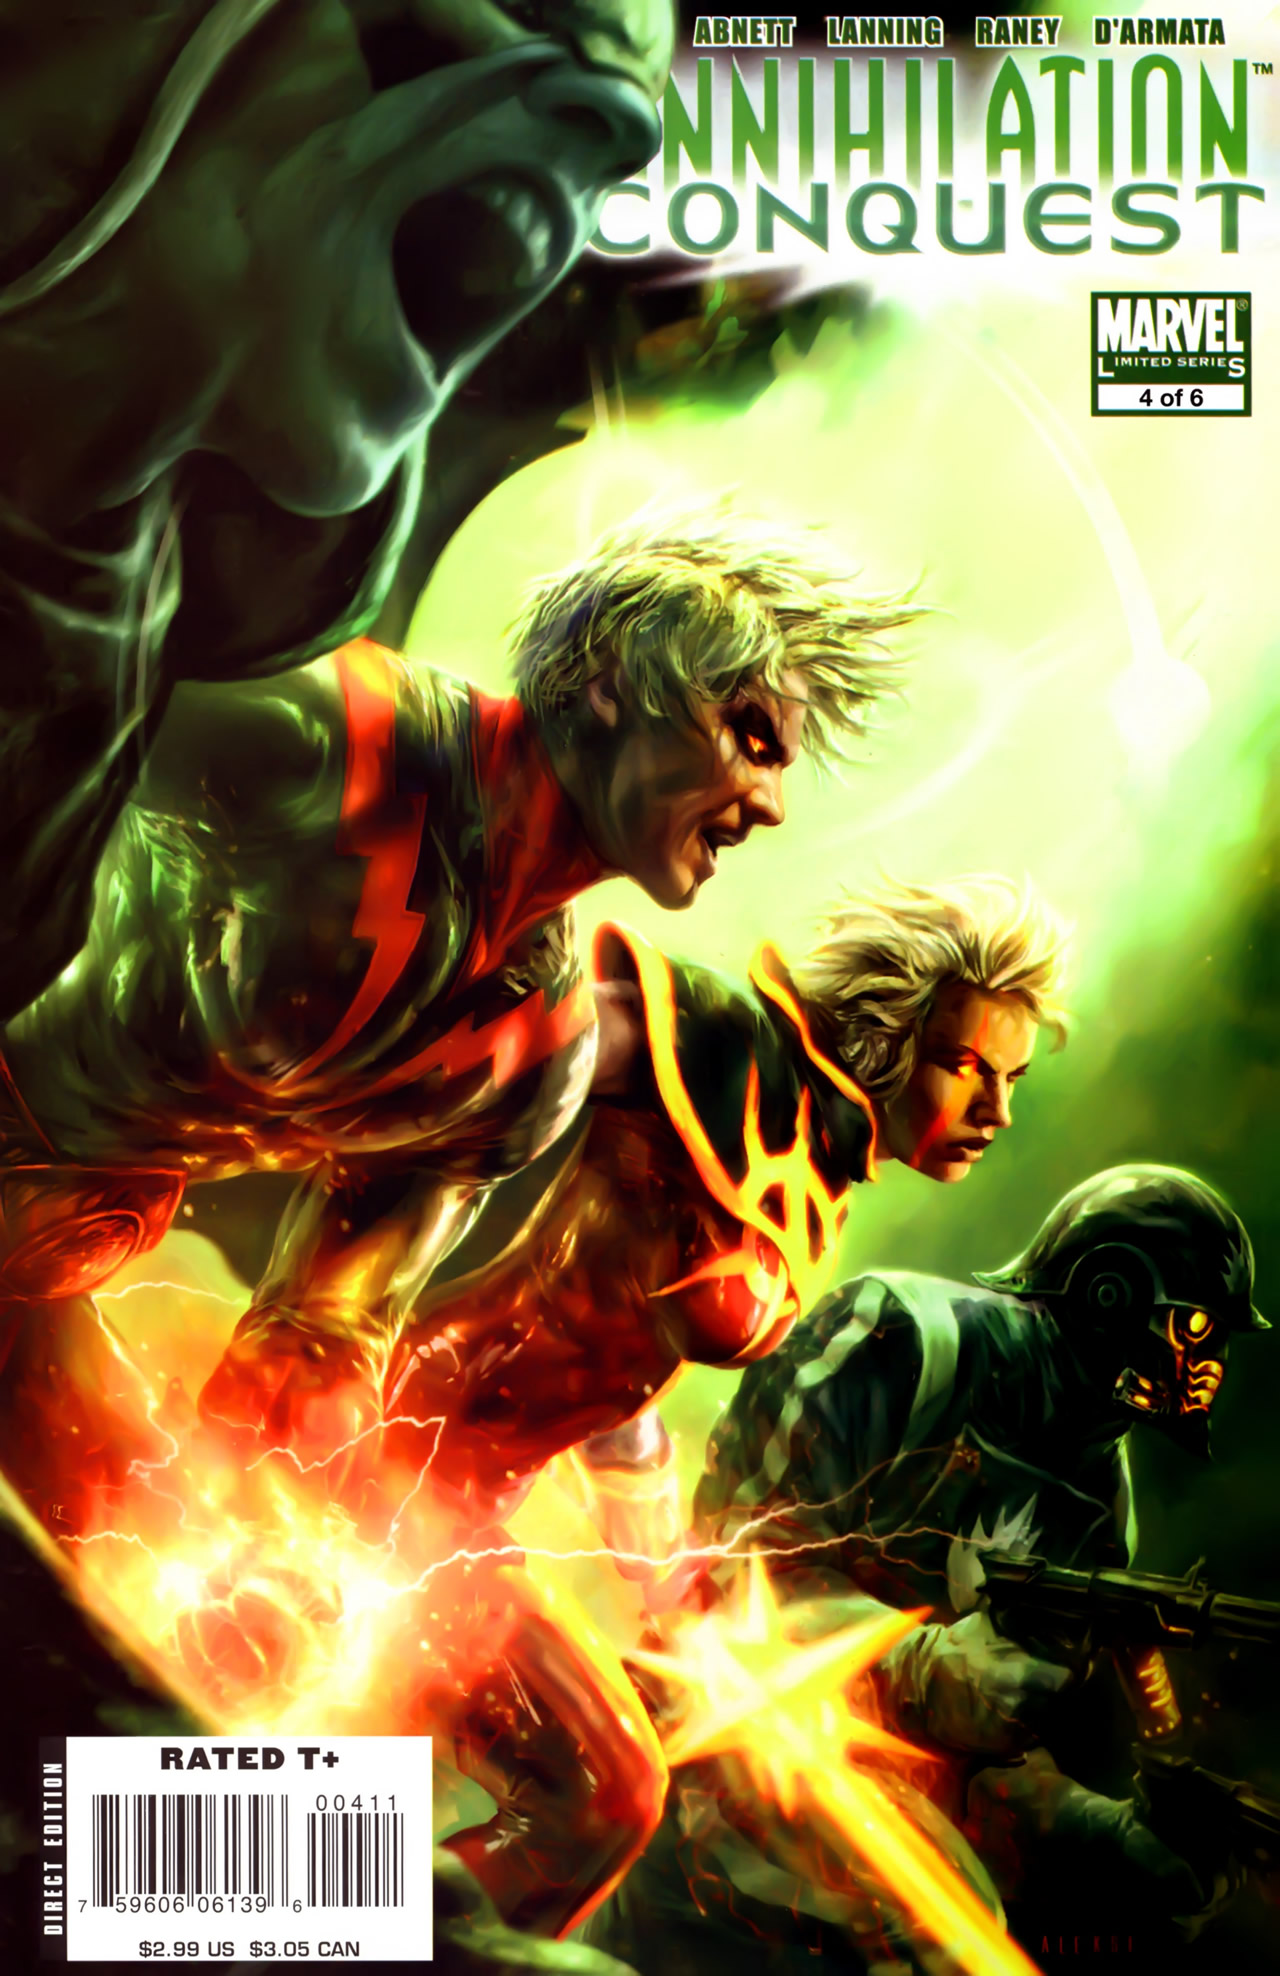 Annihilation: Conquest Vol 1 4